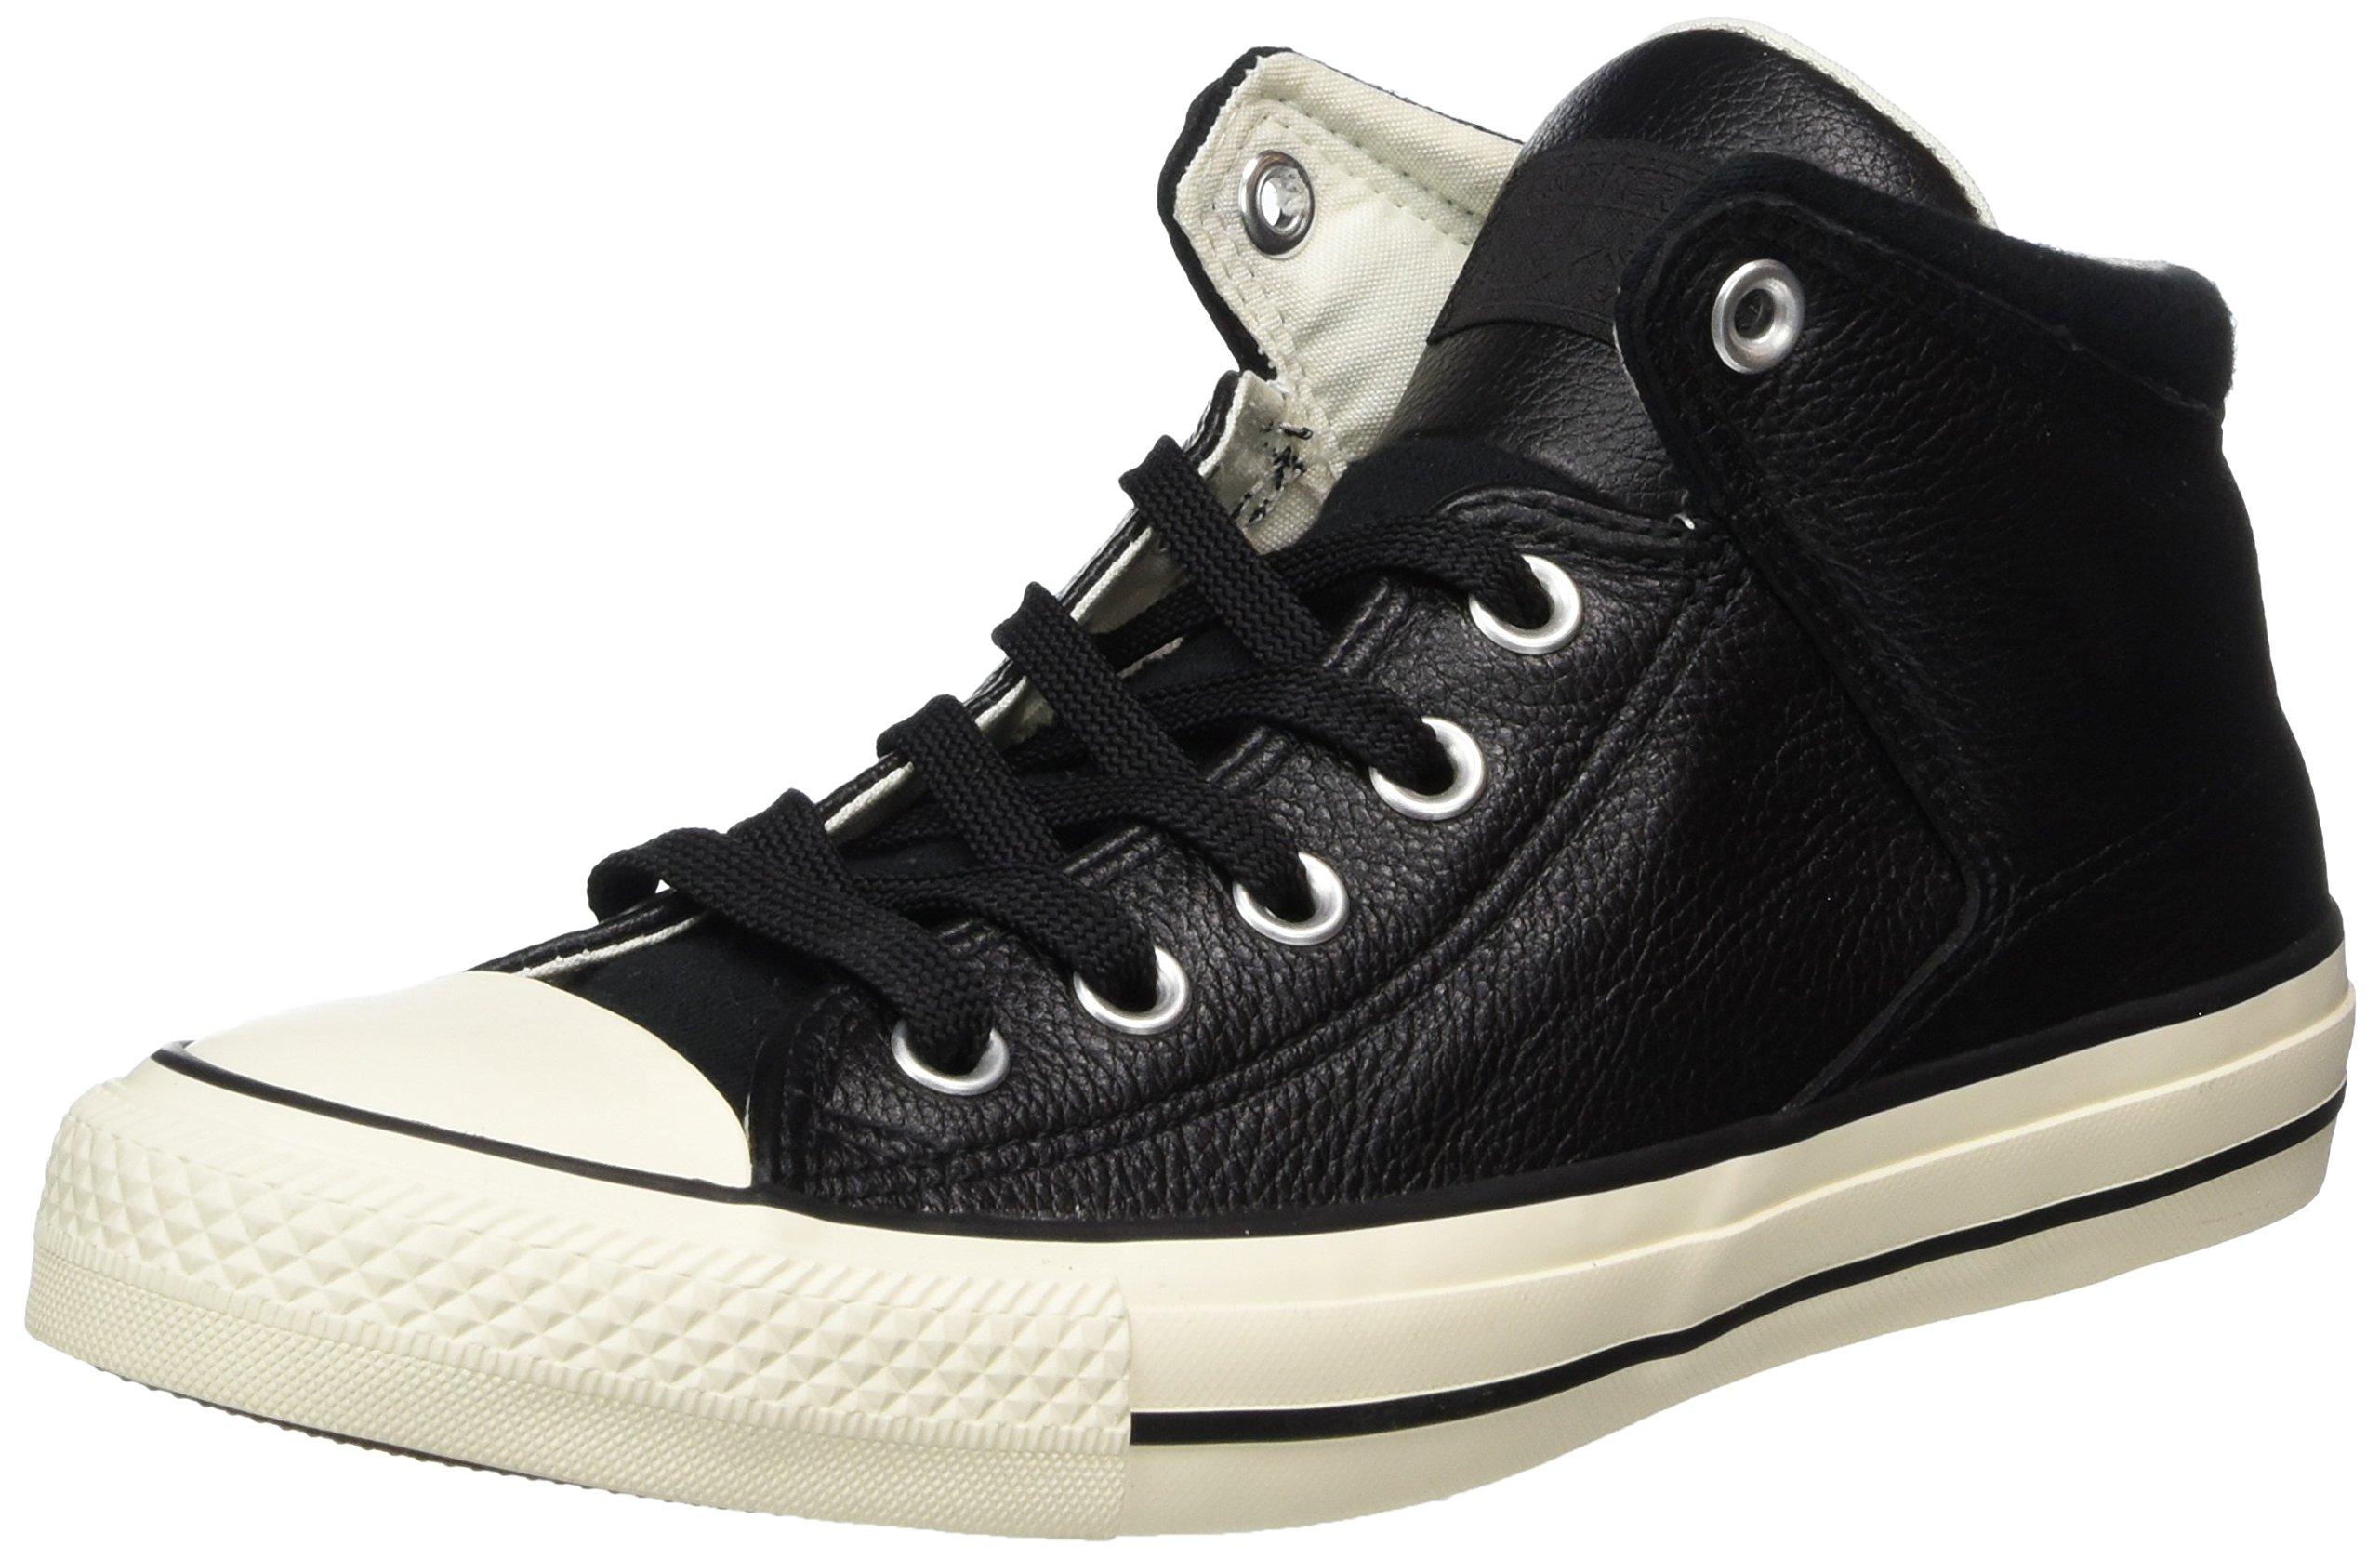 1d2756aa30d5 Galleon - Converse Mens Chuck Taylor All Star Street Hi - Tumbled Leather  Black Black Egret Sneaker - 9 Men - 11 Women